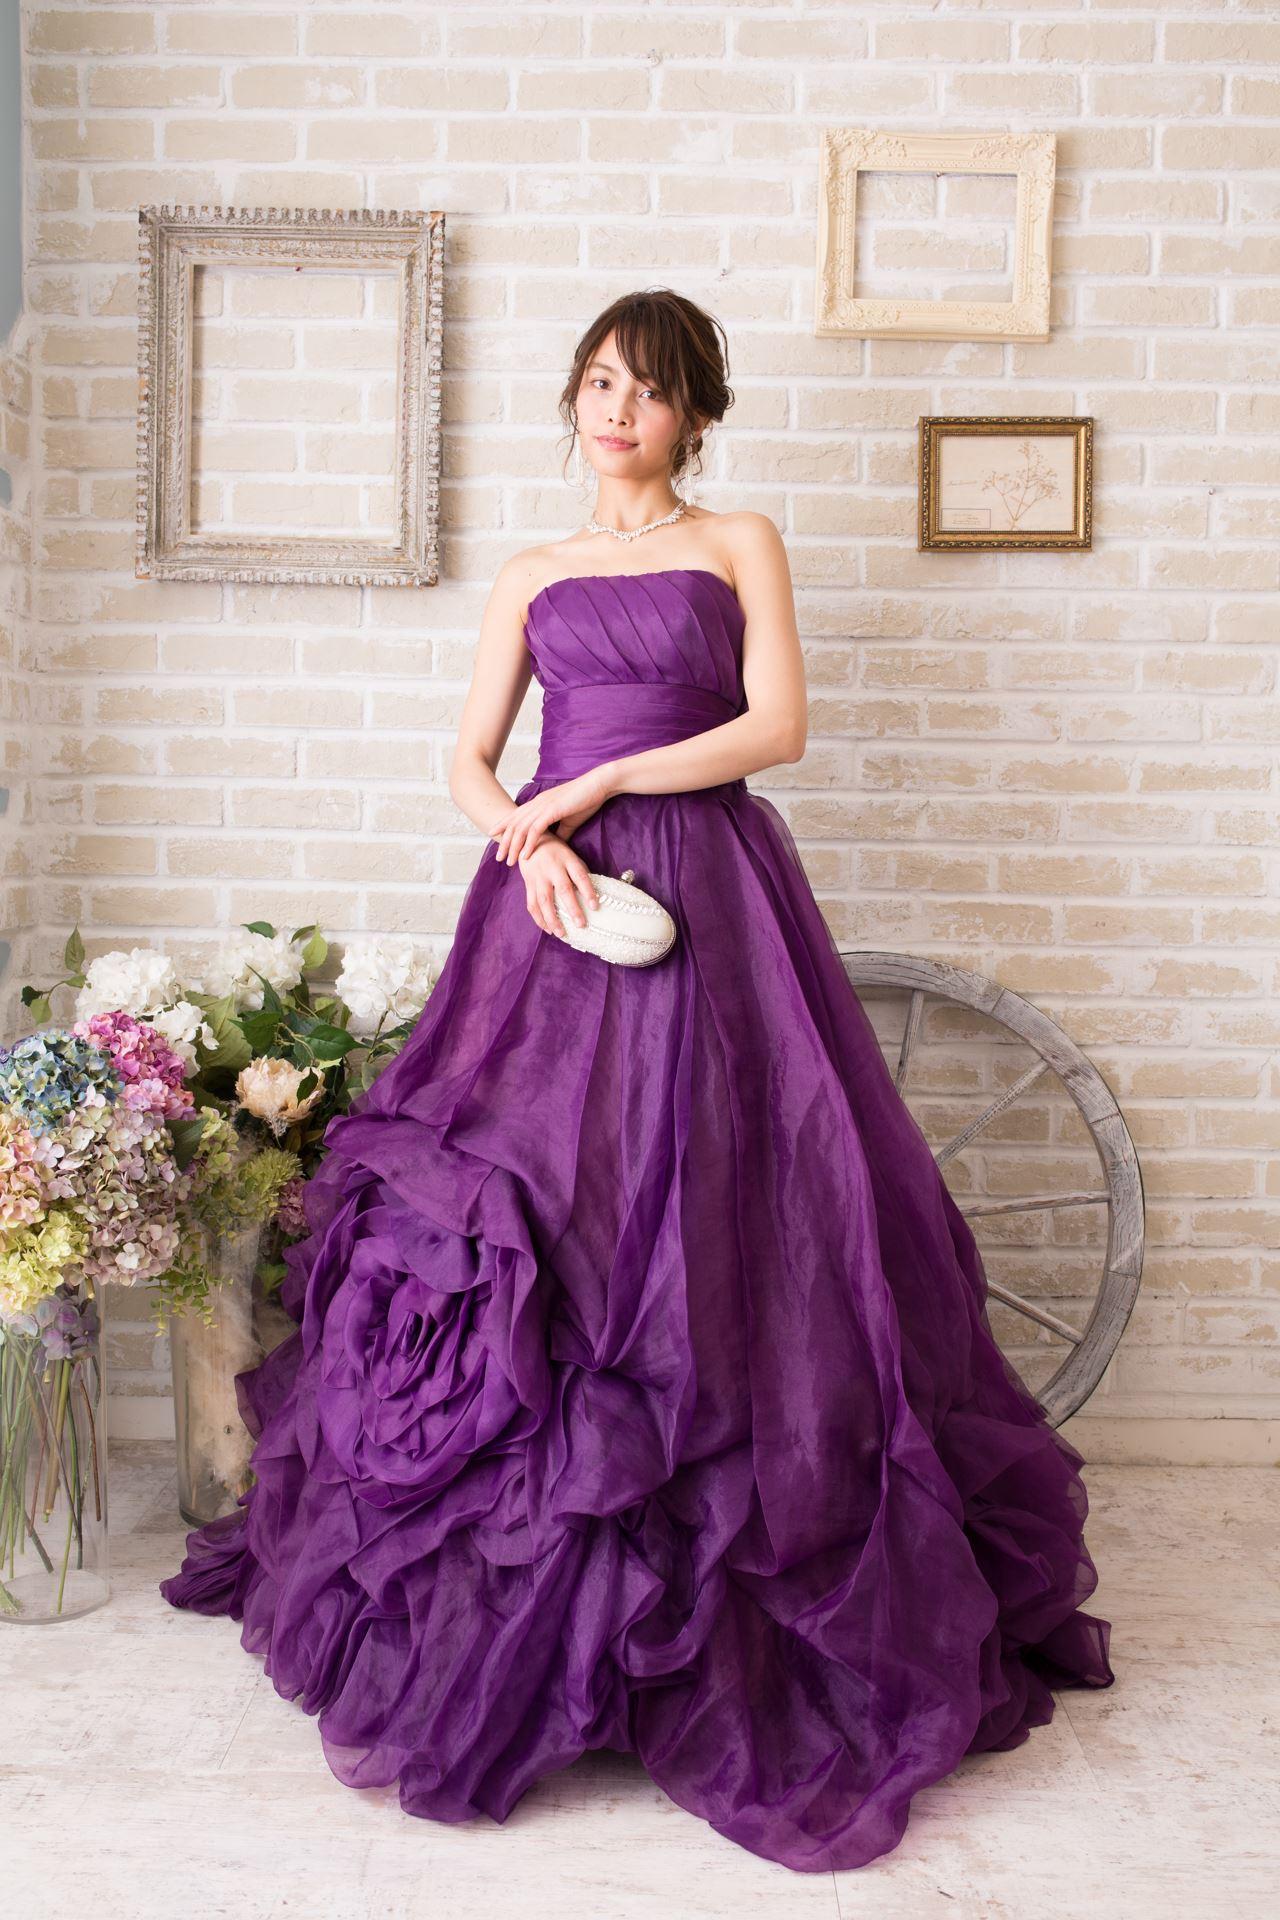 yk_nr_dress_447